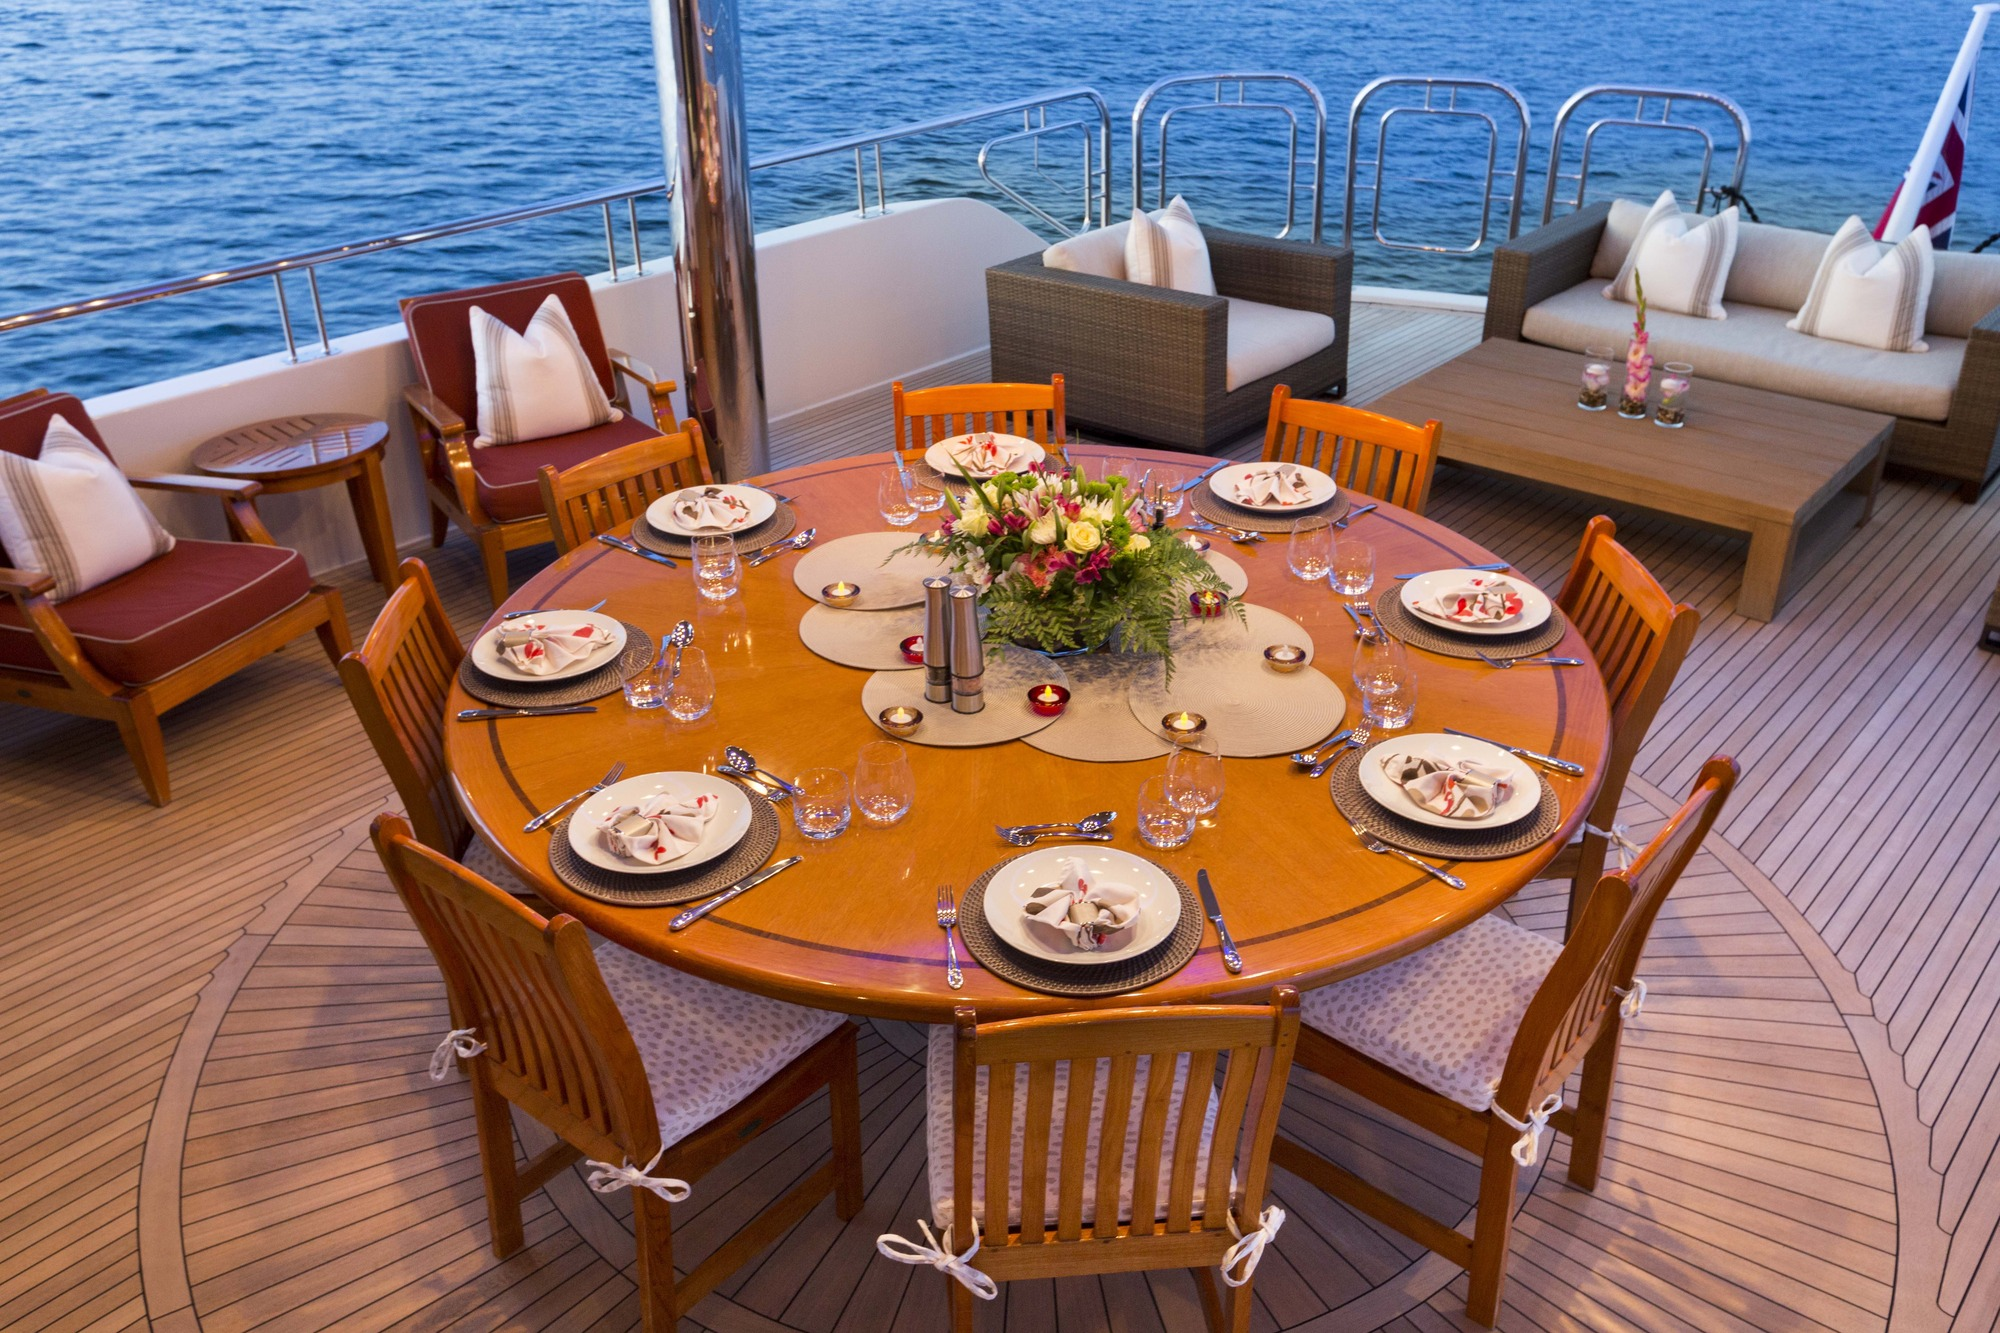 MY FAR FROM IT - Alfresco dining upper deck